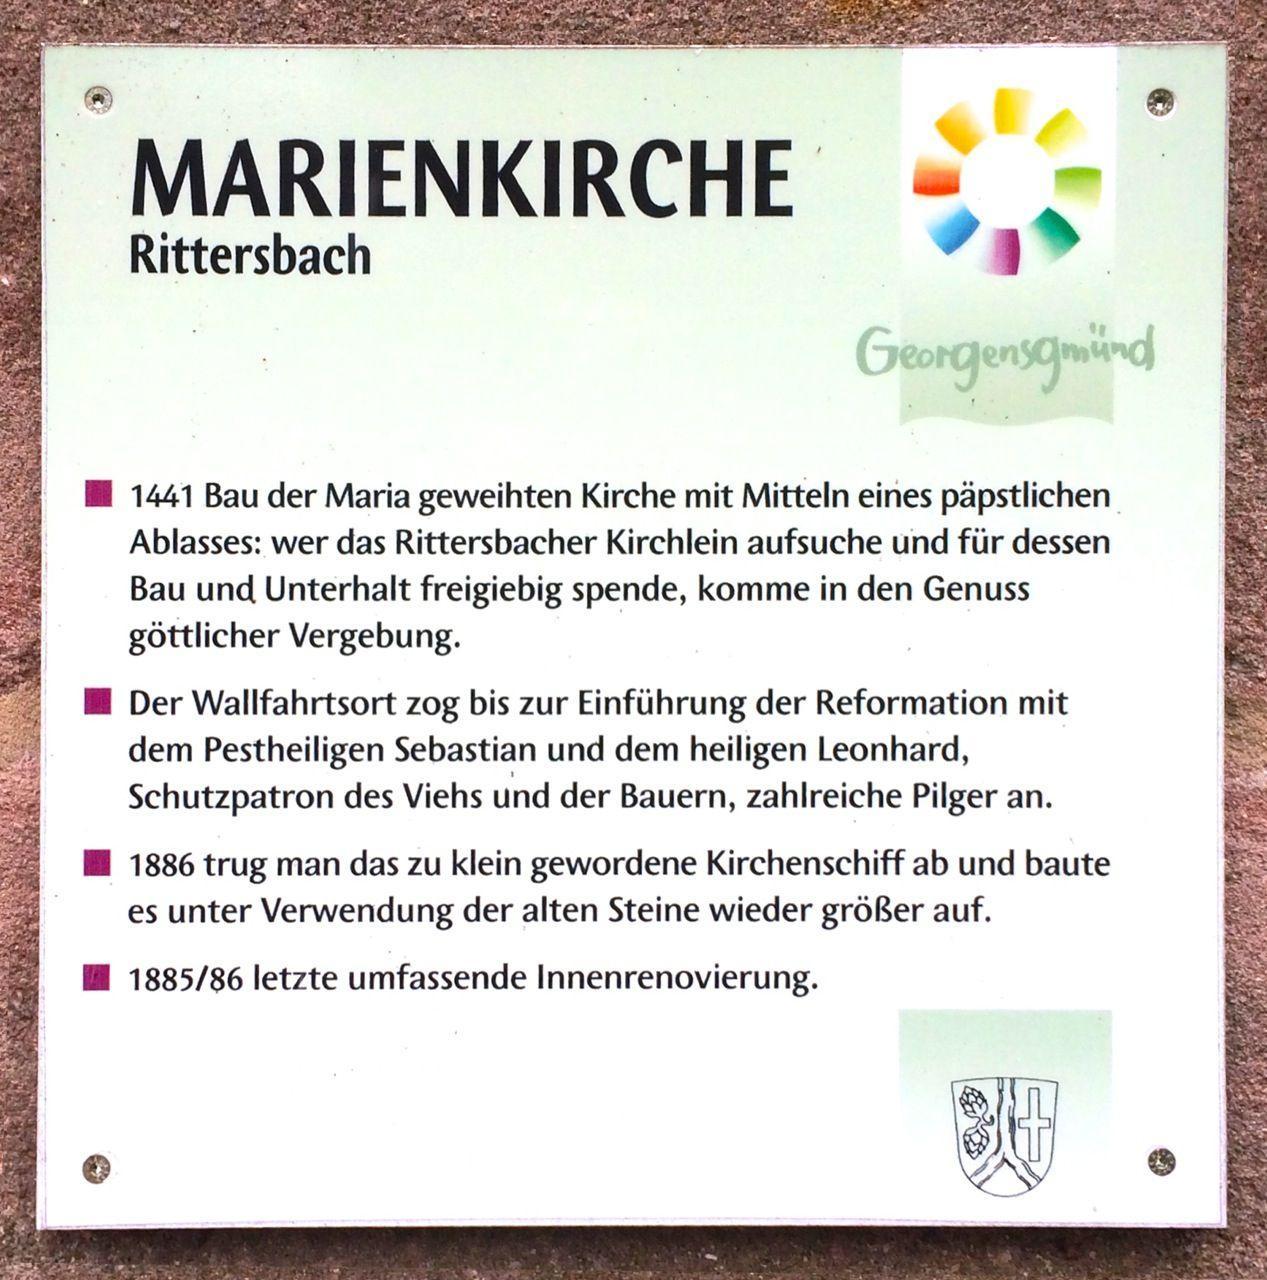 Geschichte Marienkirche kurz